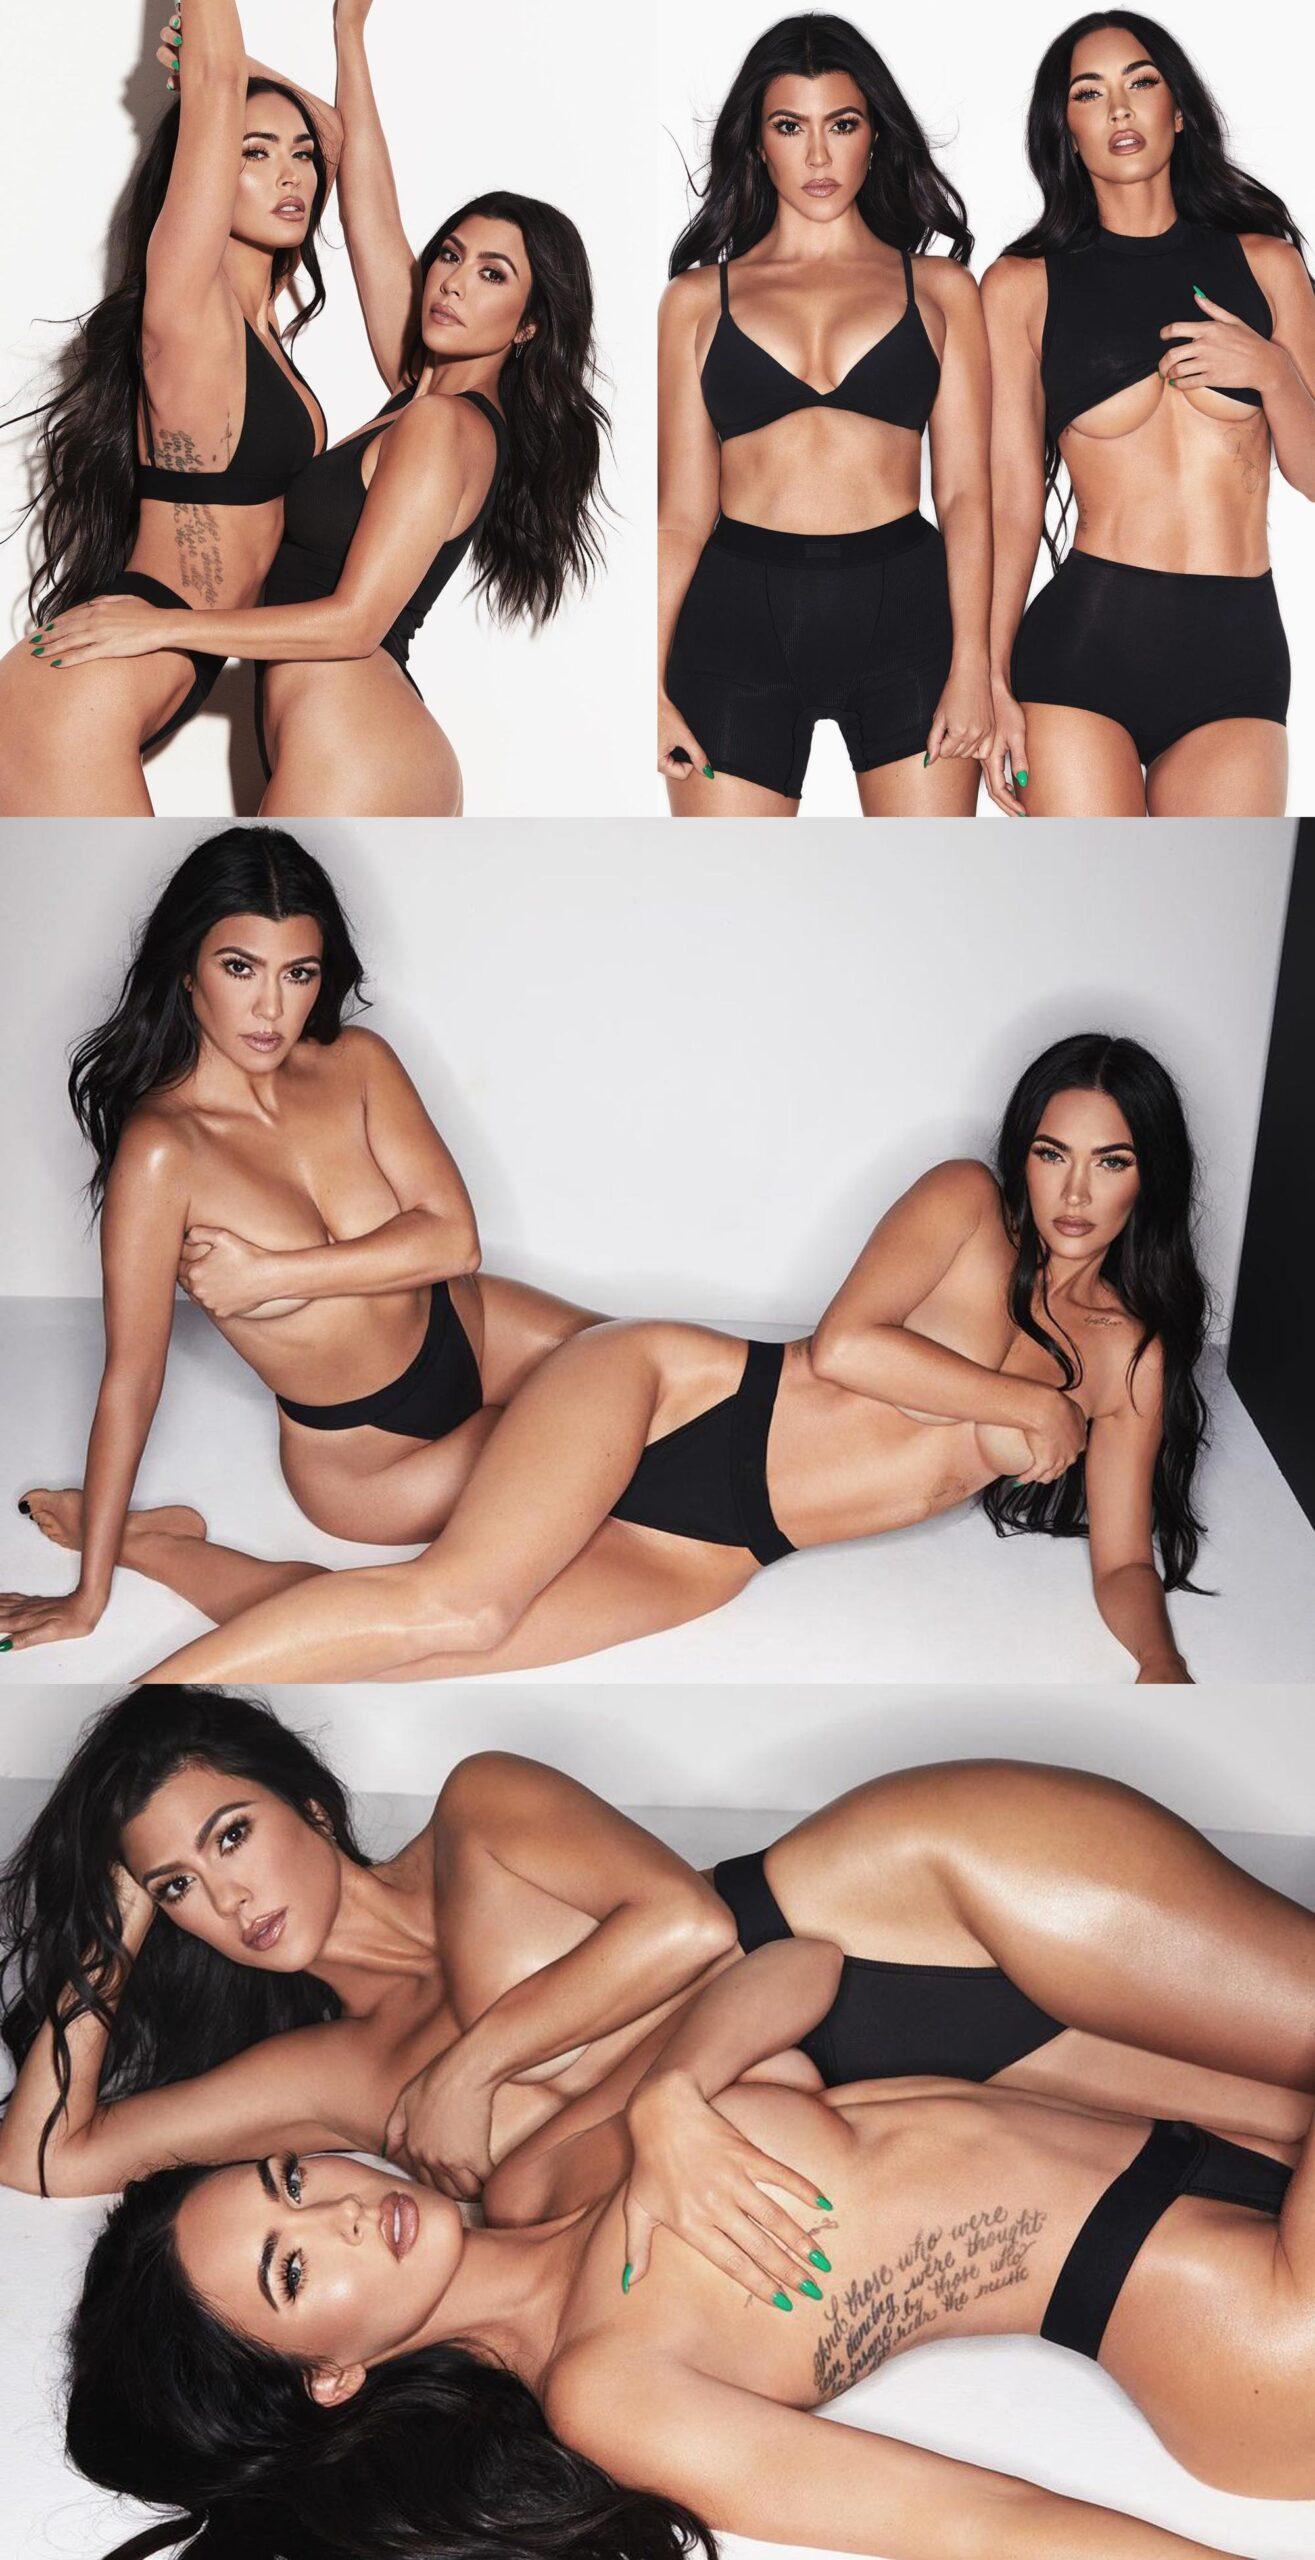 Megan Fox og Kourtney Kardashian for Kim Kardashians nye kolleksjon (SKIMS)